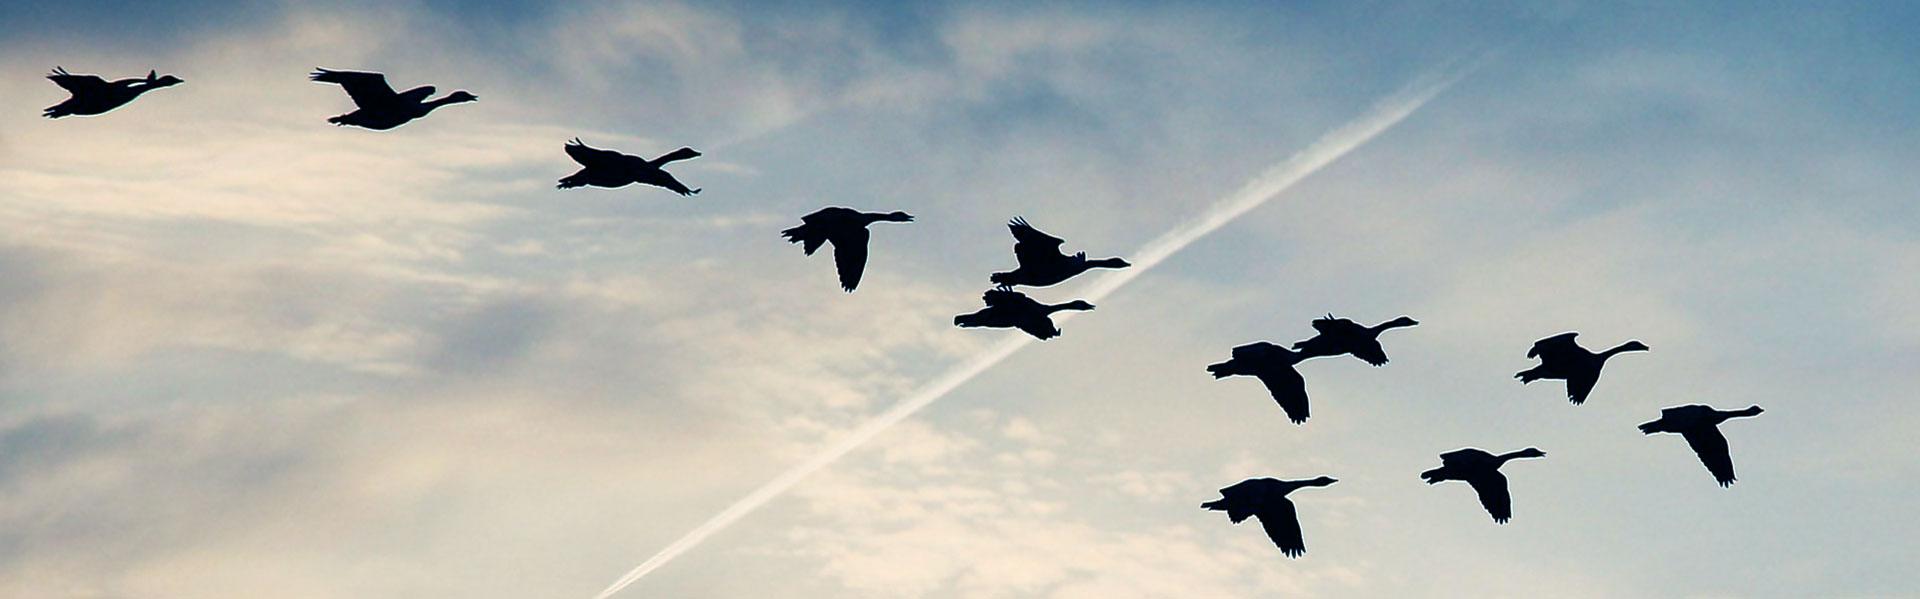 Oies qui volent dans le ciel